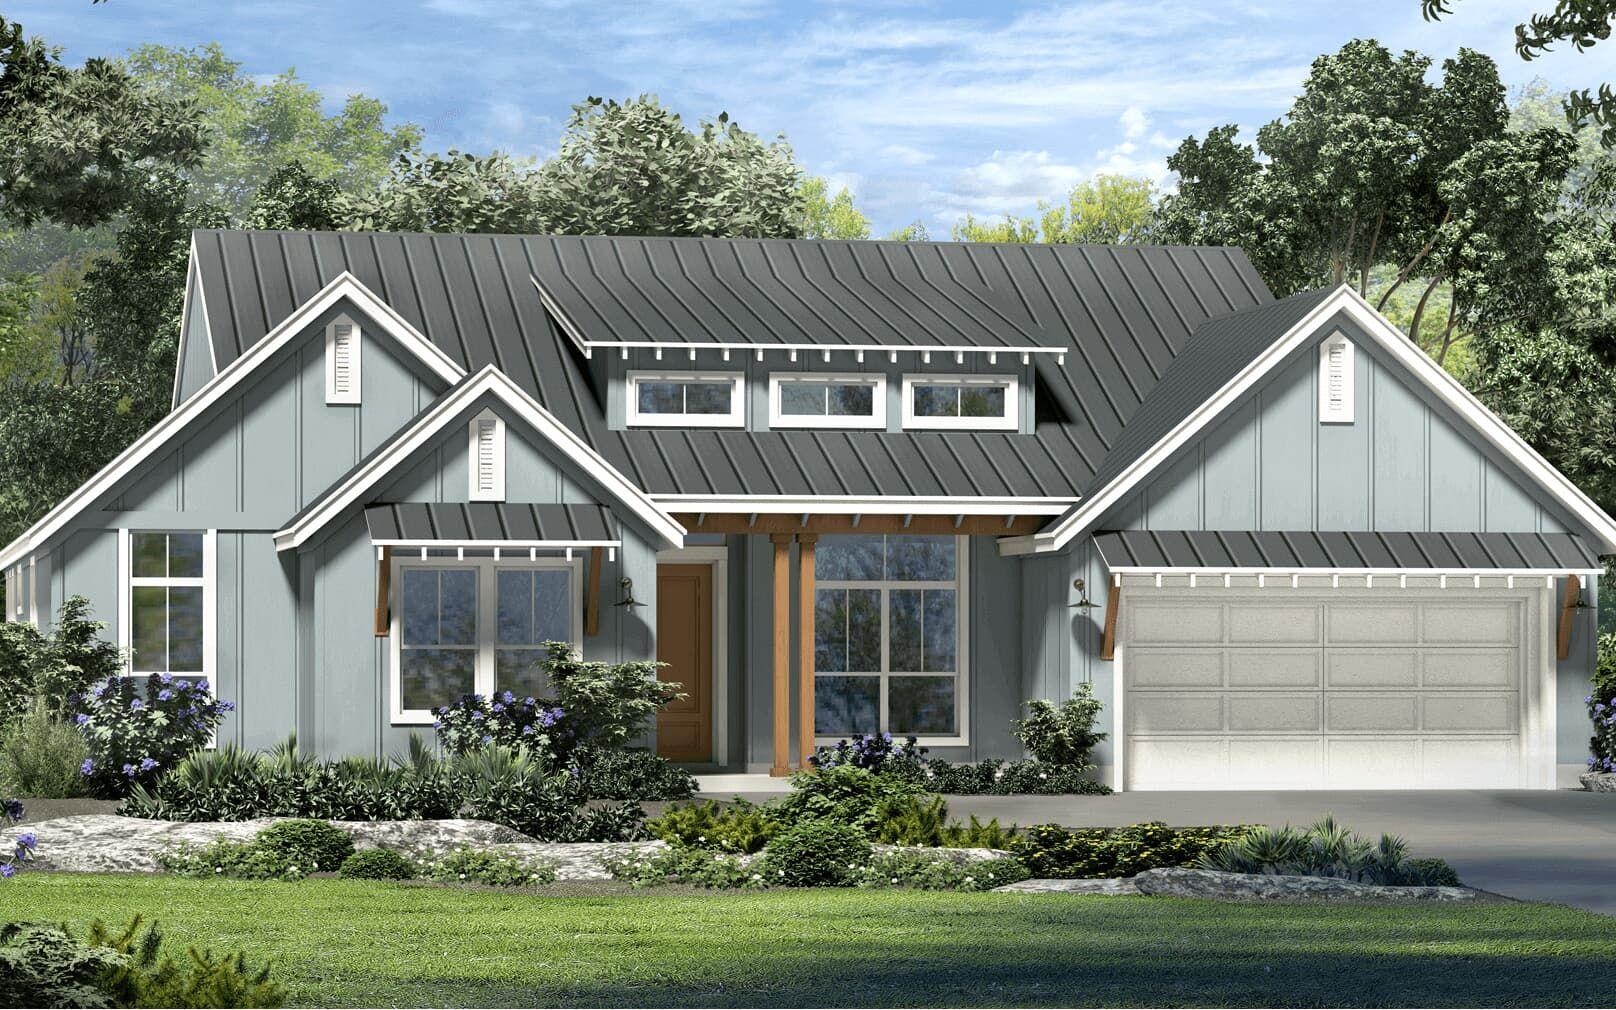 Exterior:floor plan vassar modern farmhouse kissing tree san marcos texas